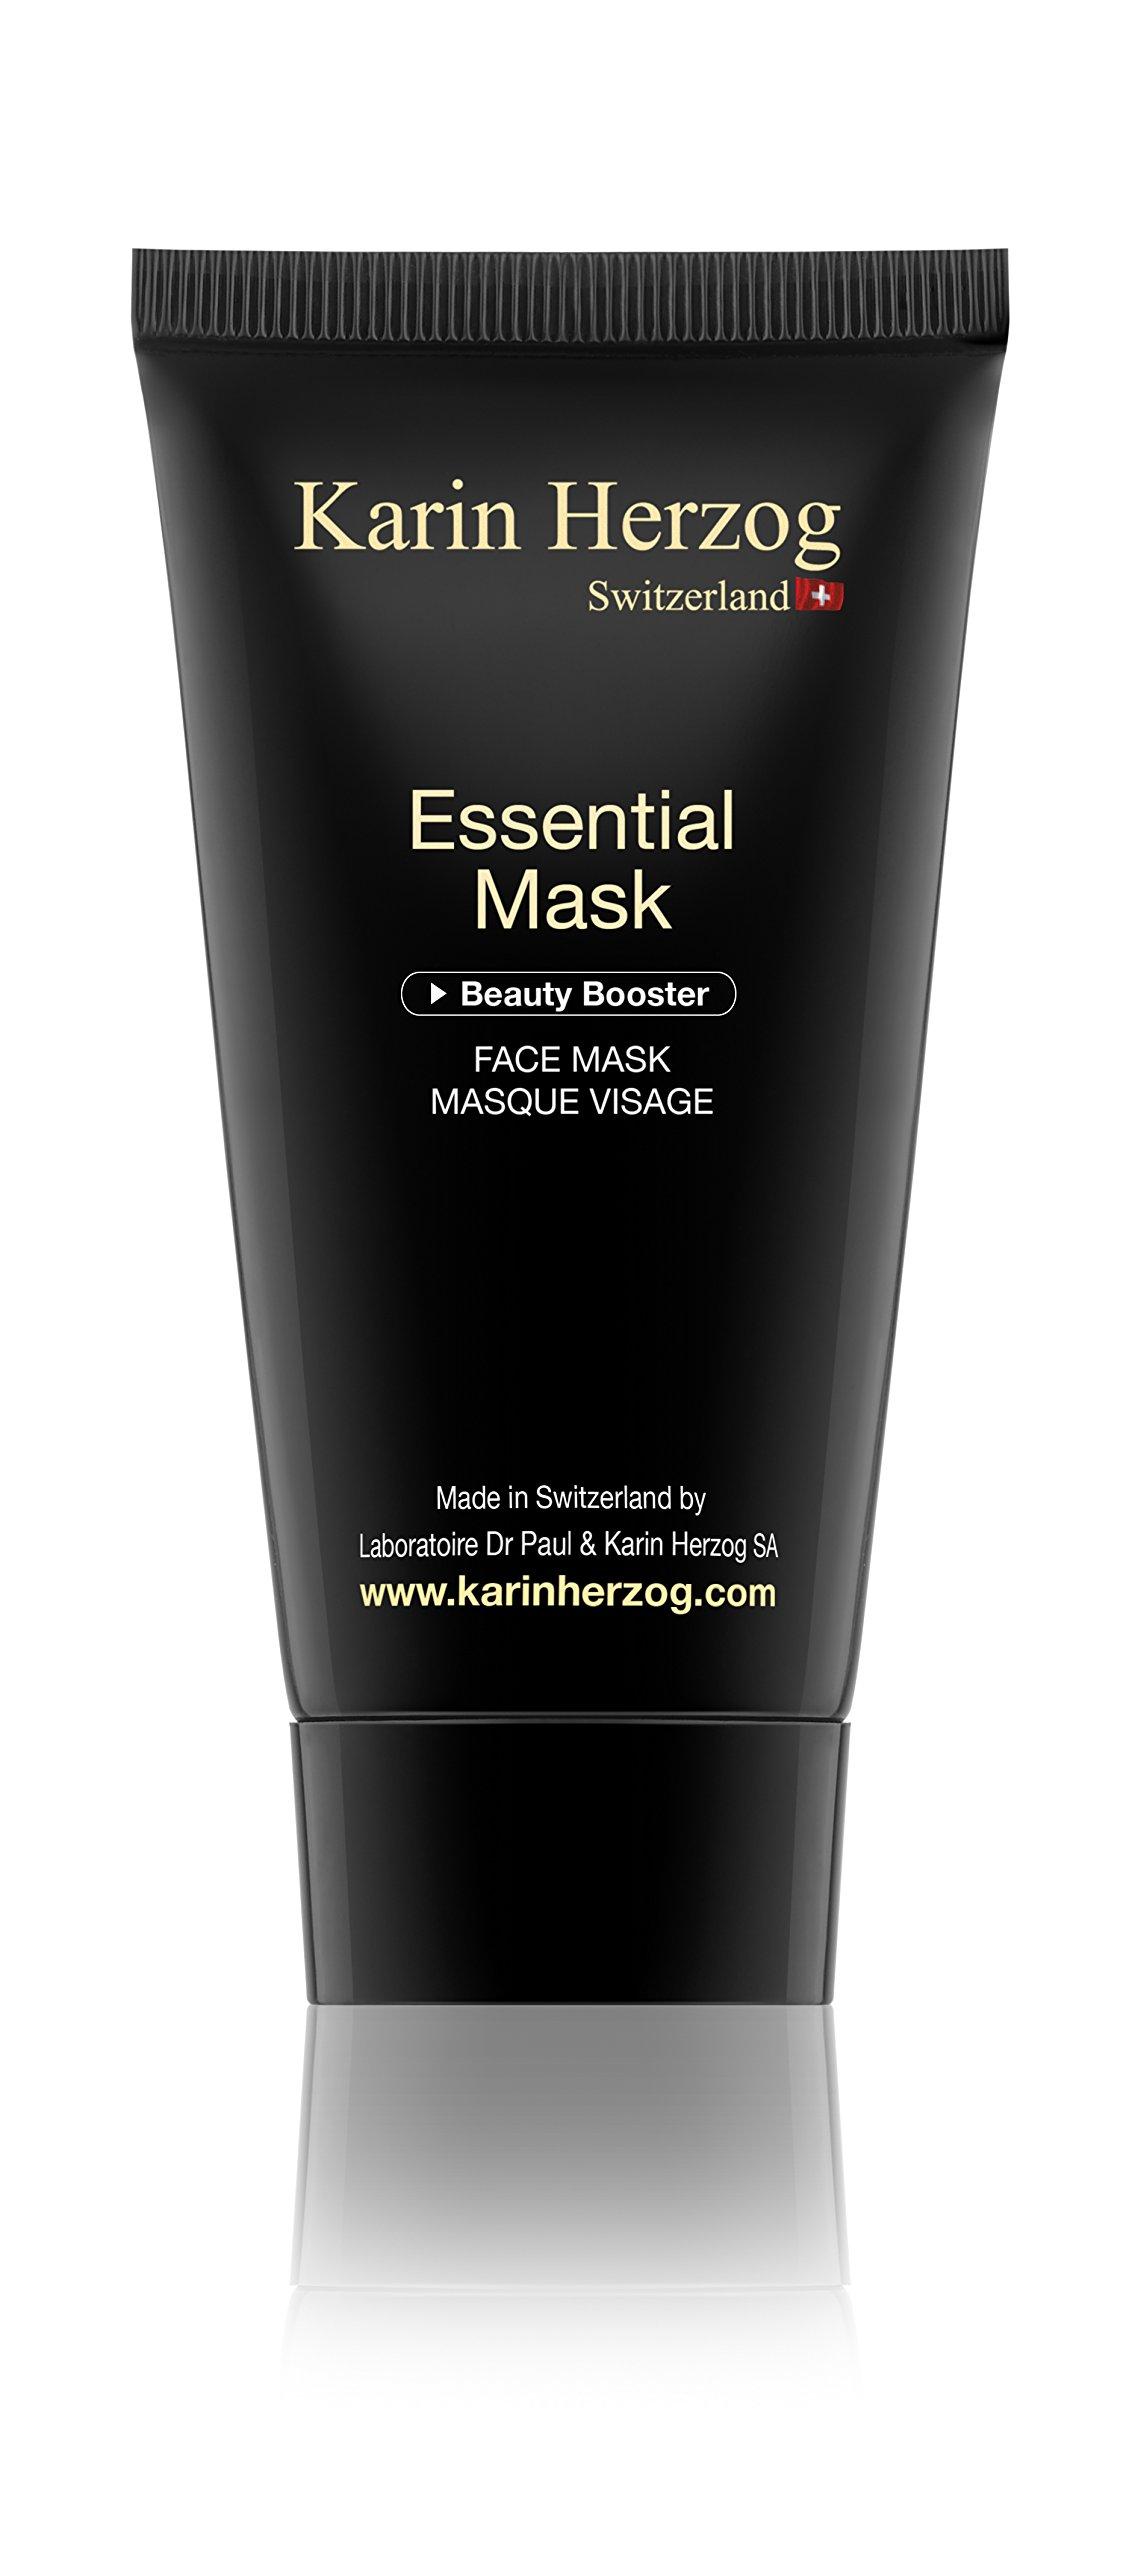 Karin Herzog Essential Mask, 1.7 Ounce